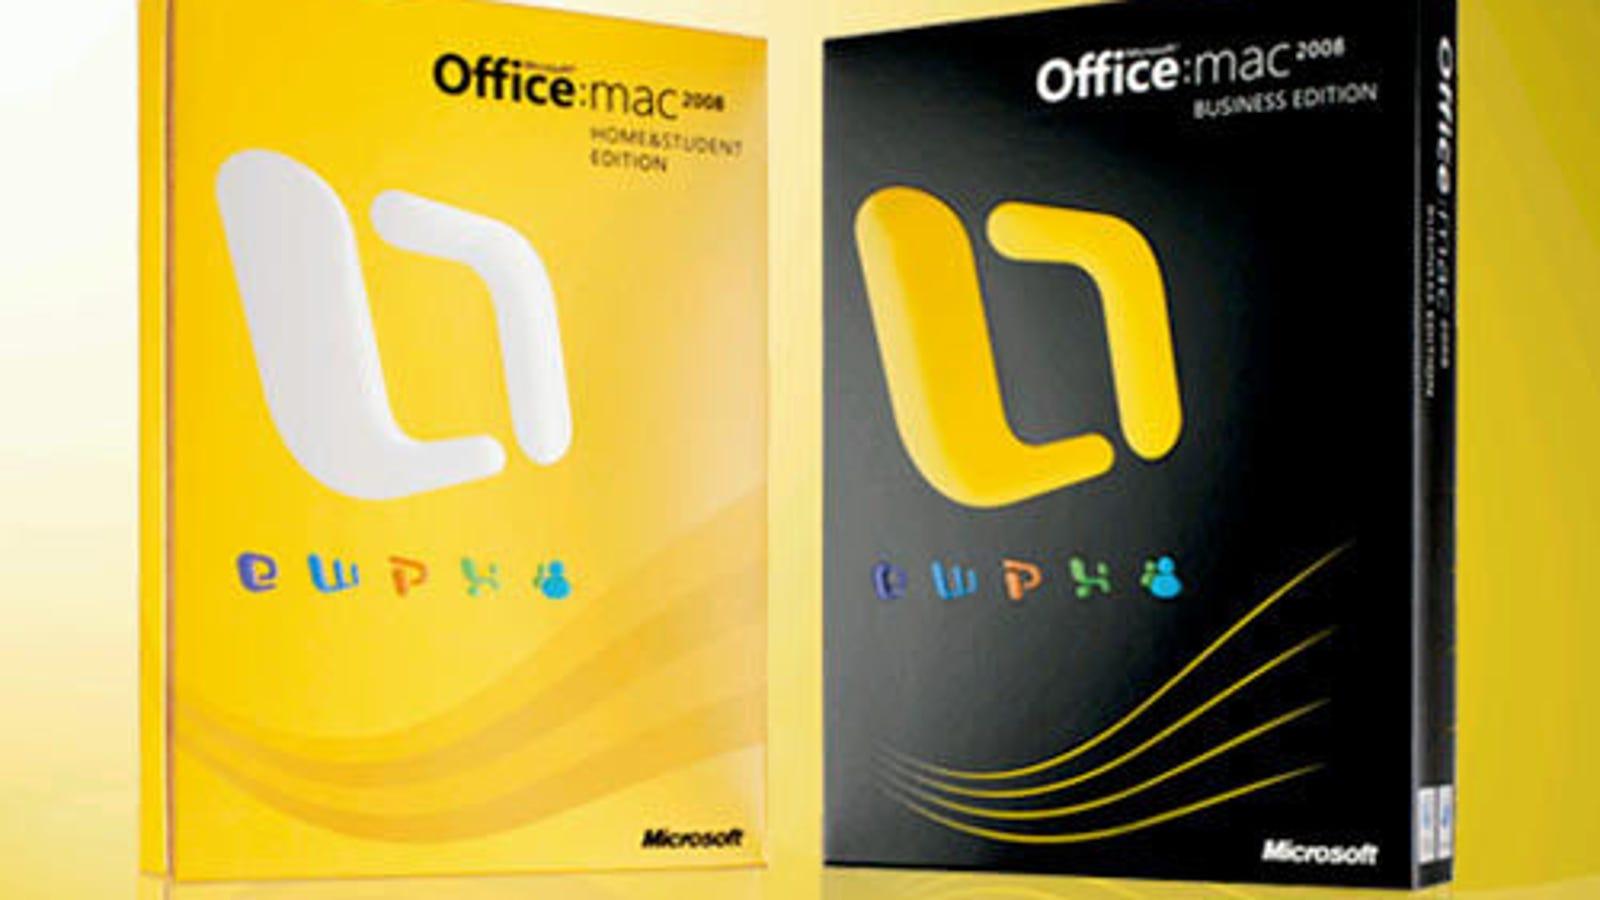 buy Office 2010 for mac